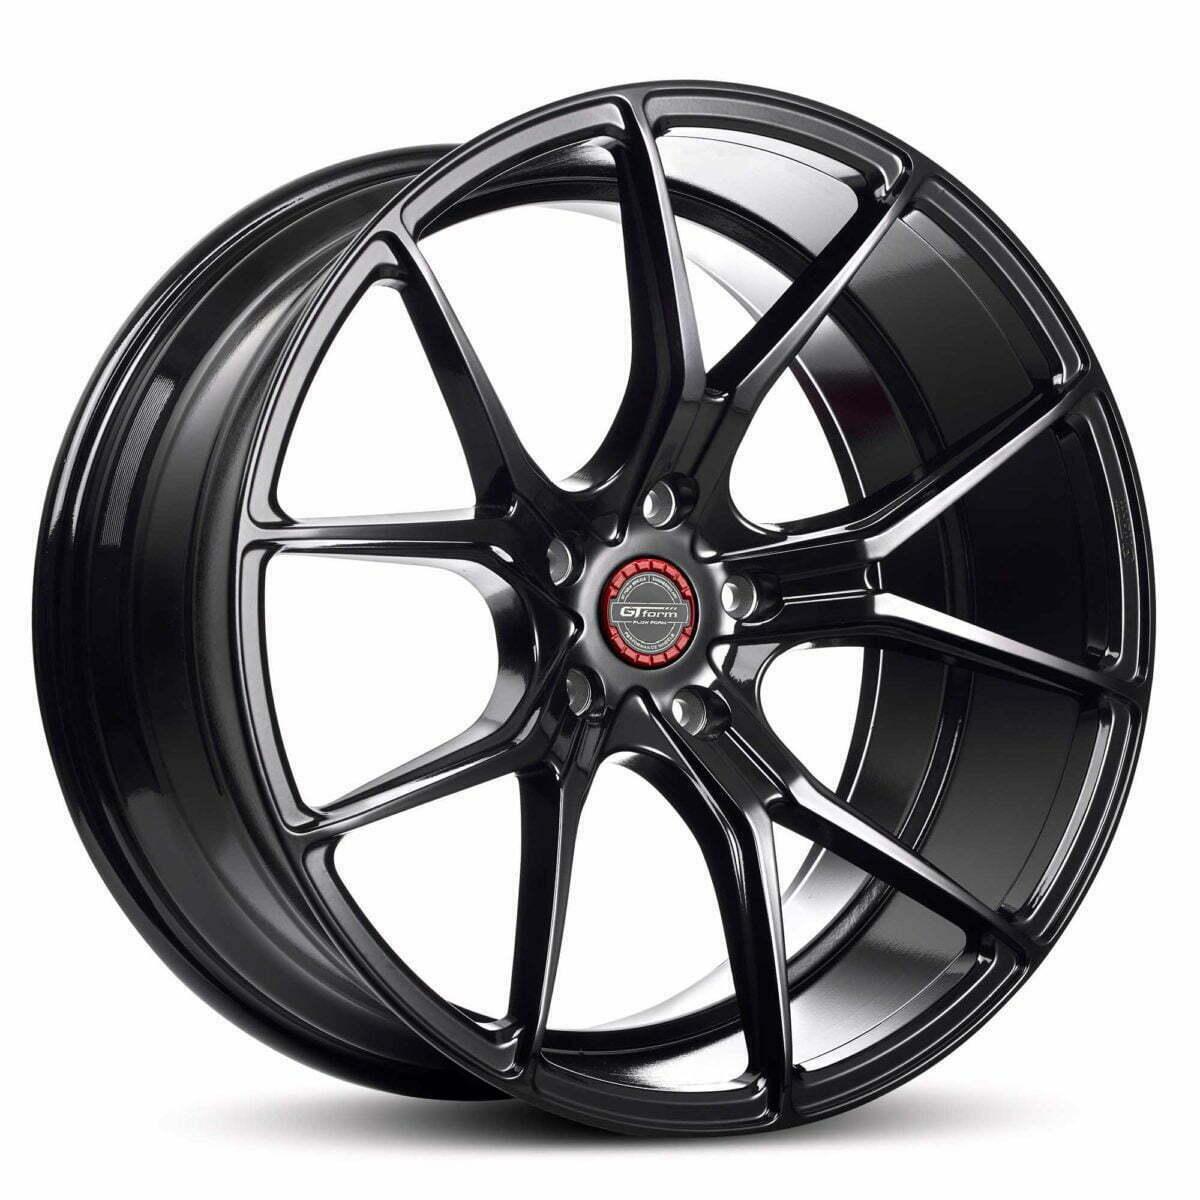 GT form Venom Gloss Black Wheels With Red Centre Cap Performance Rims